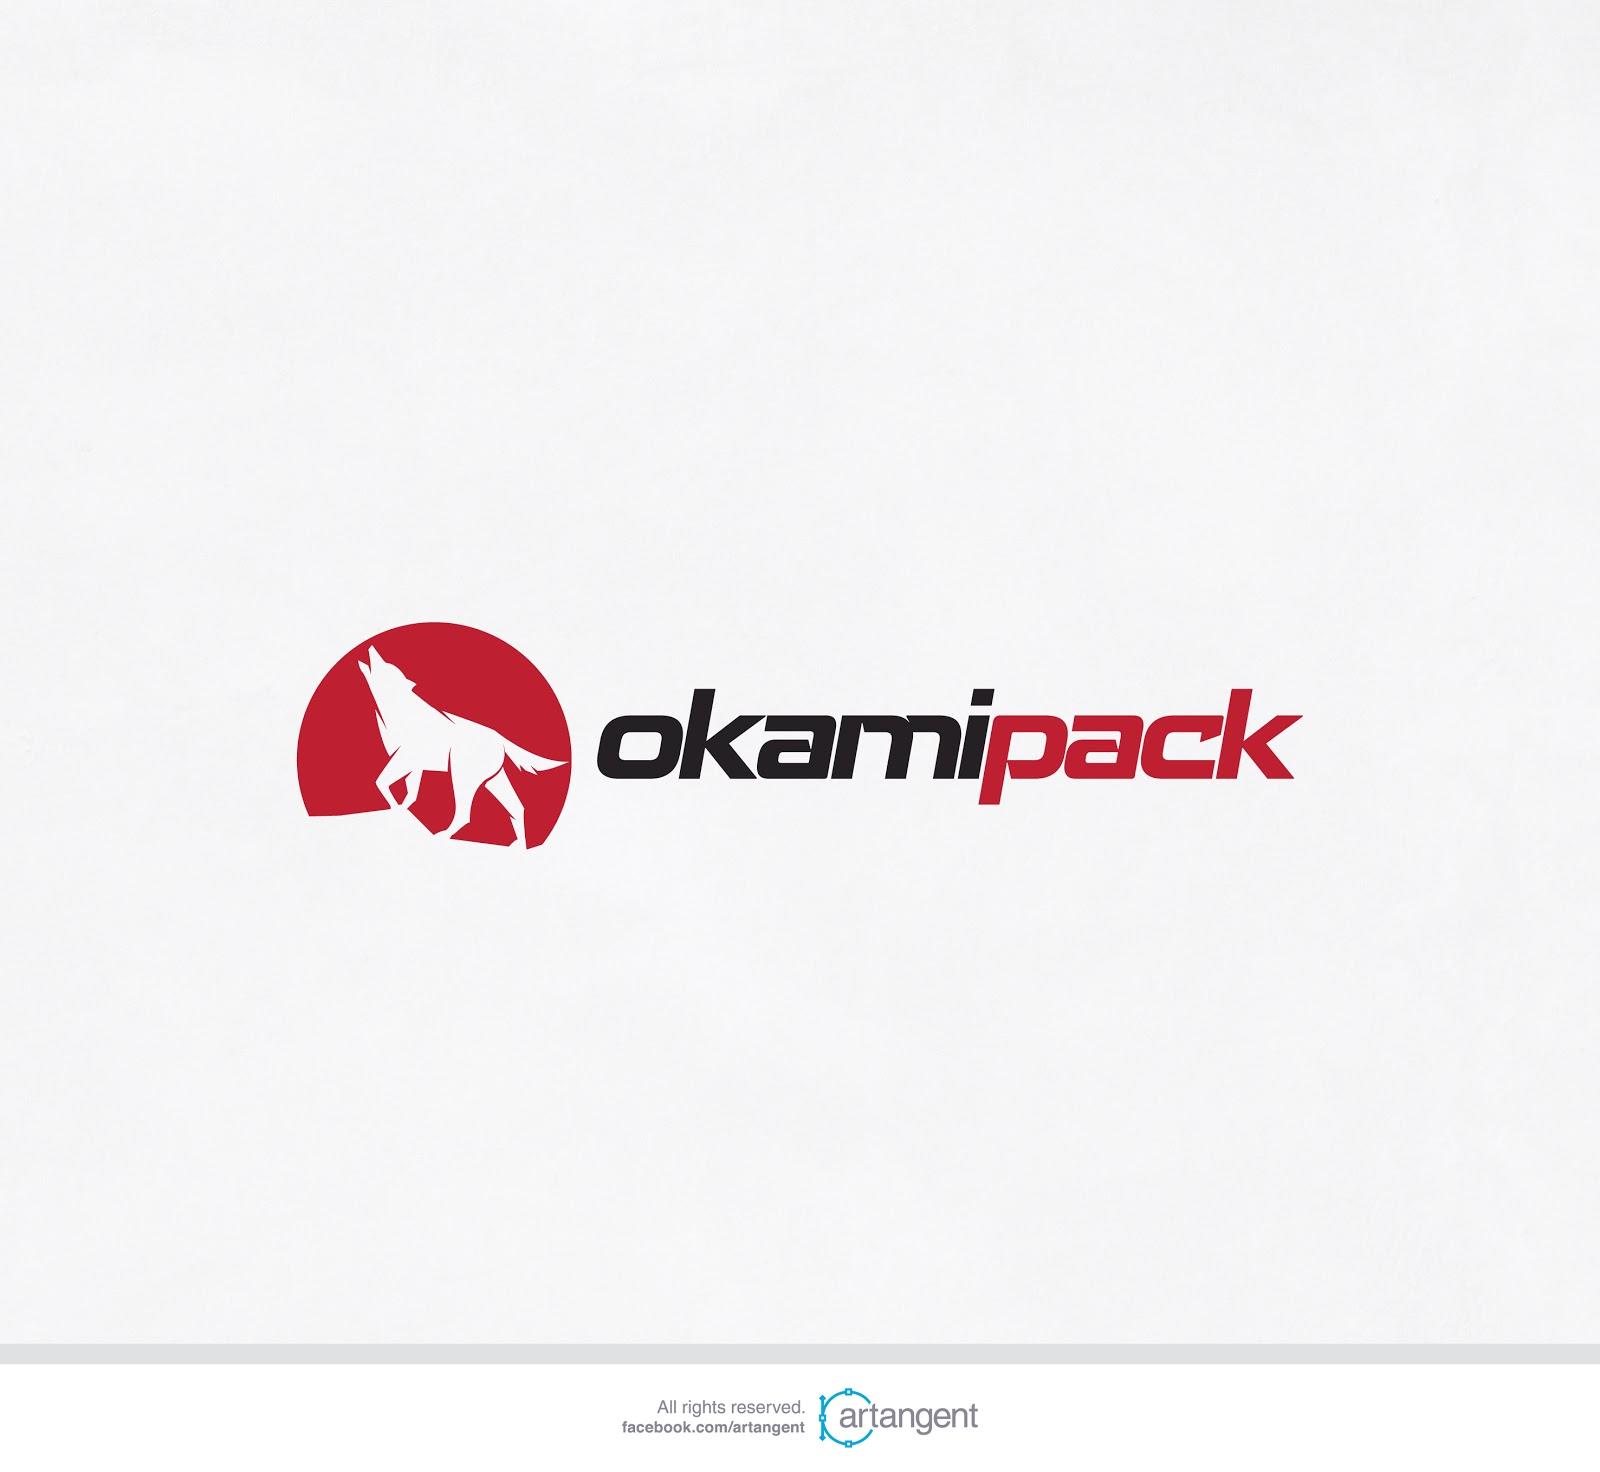 Okami Pack's Logo